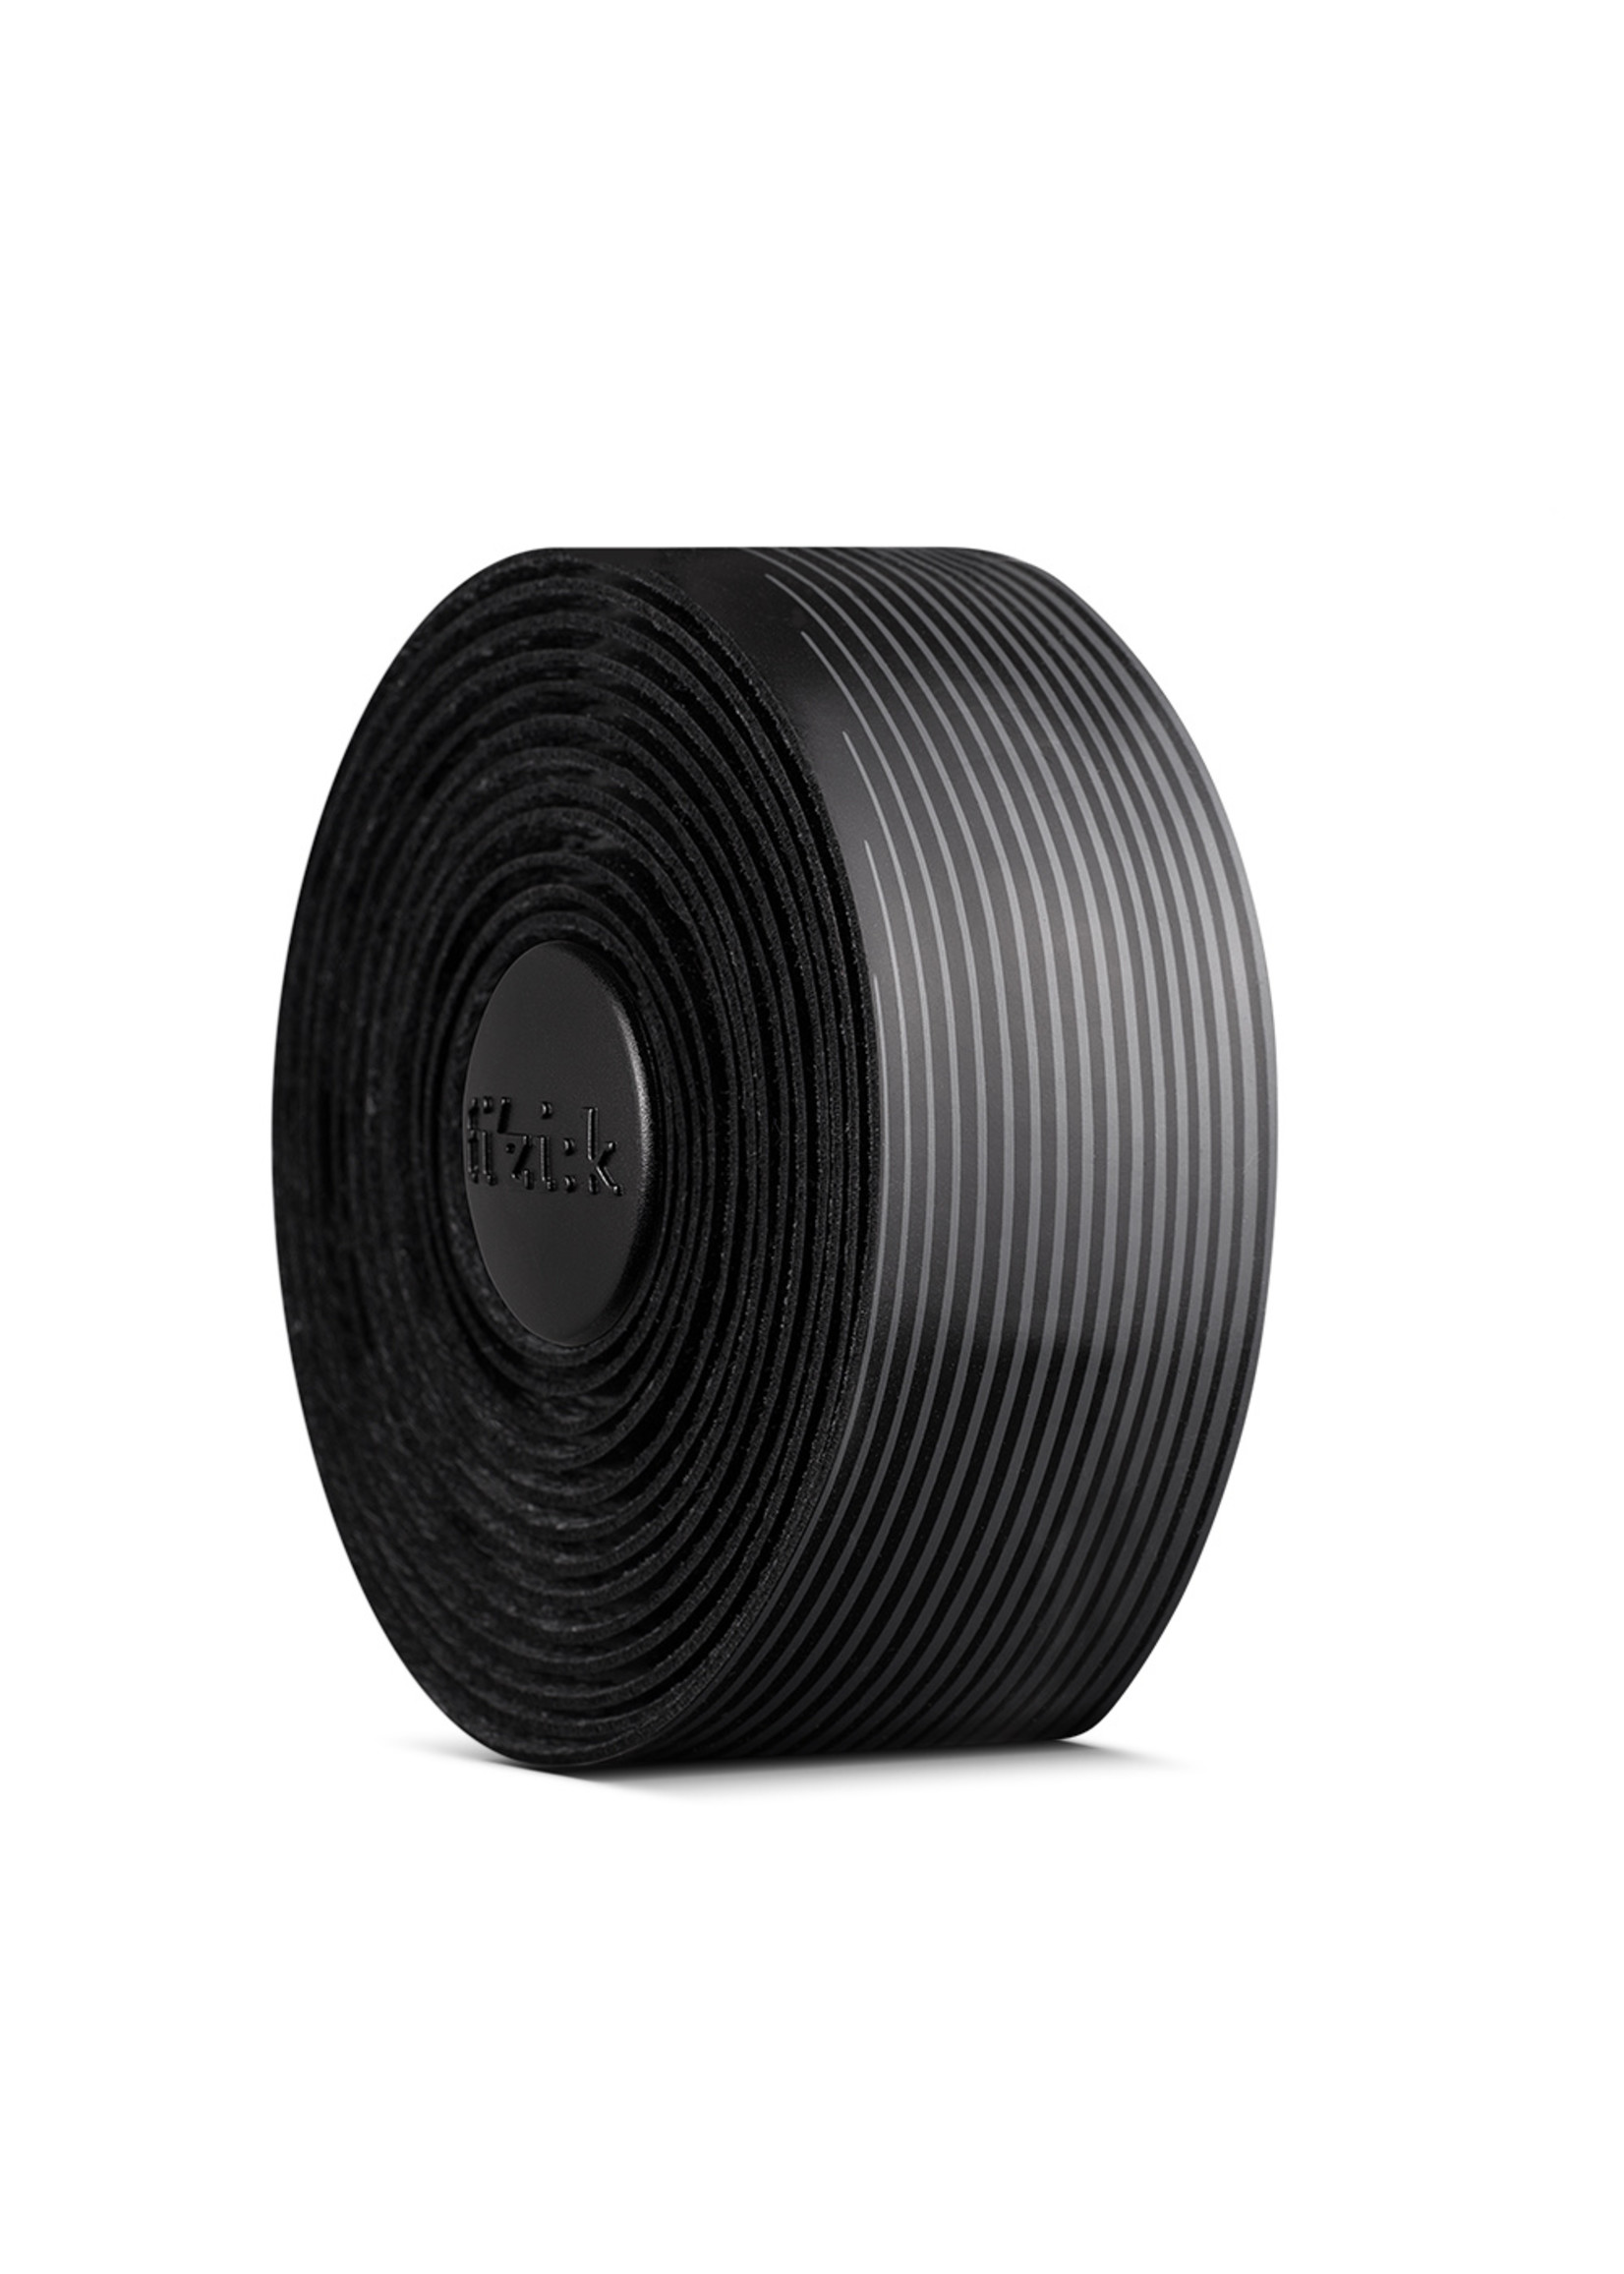 Fizik Vento - 2mm - Microtex - Tacky - BLACK / GREY Bar tape